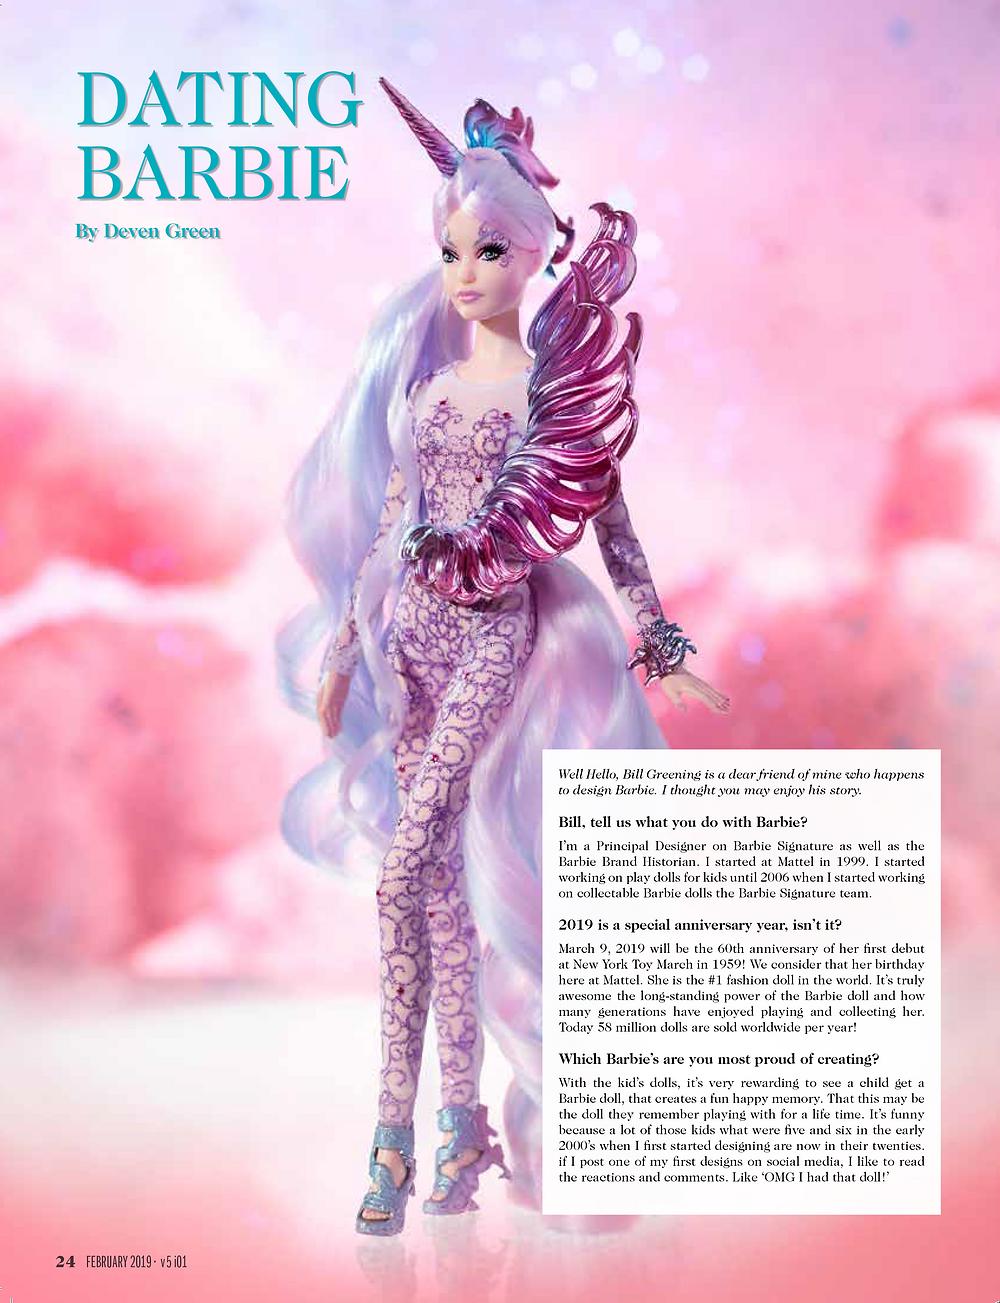 Deven Green Barbie Bill Greening